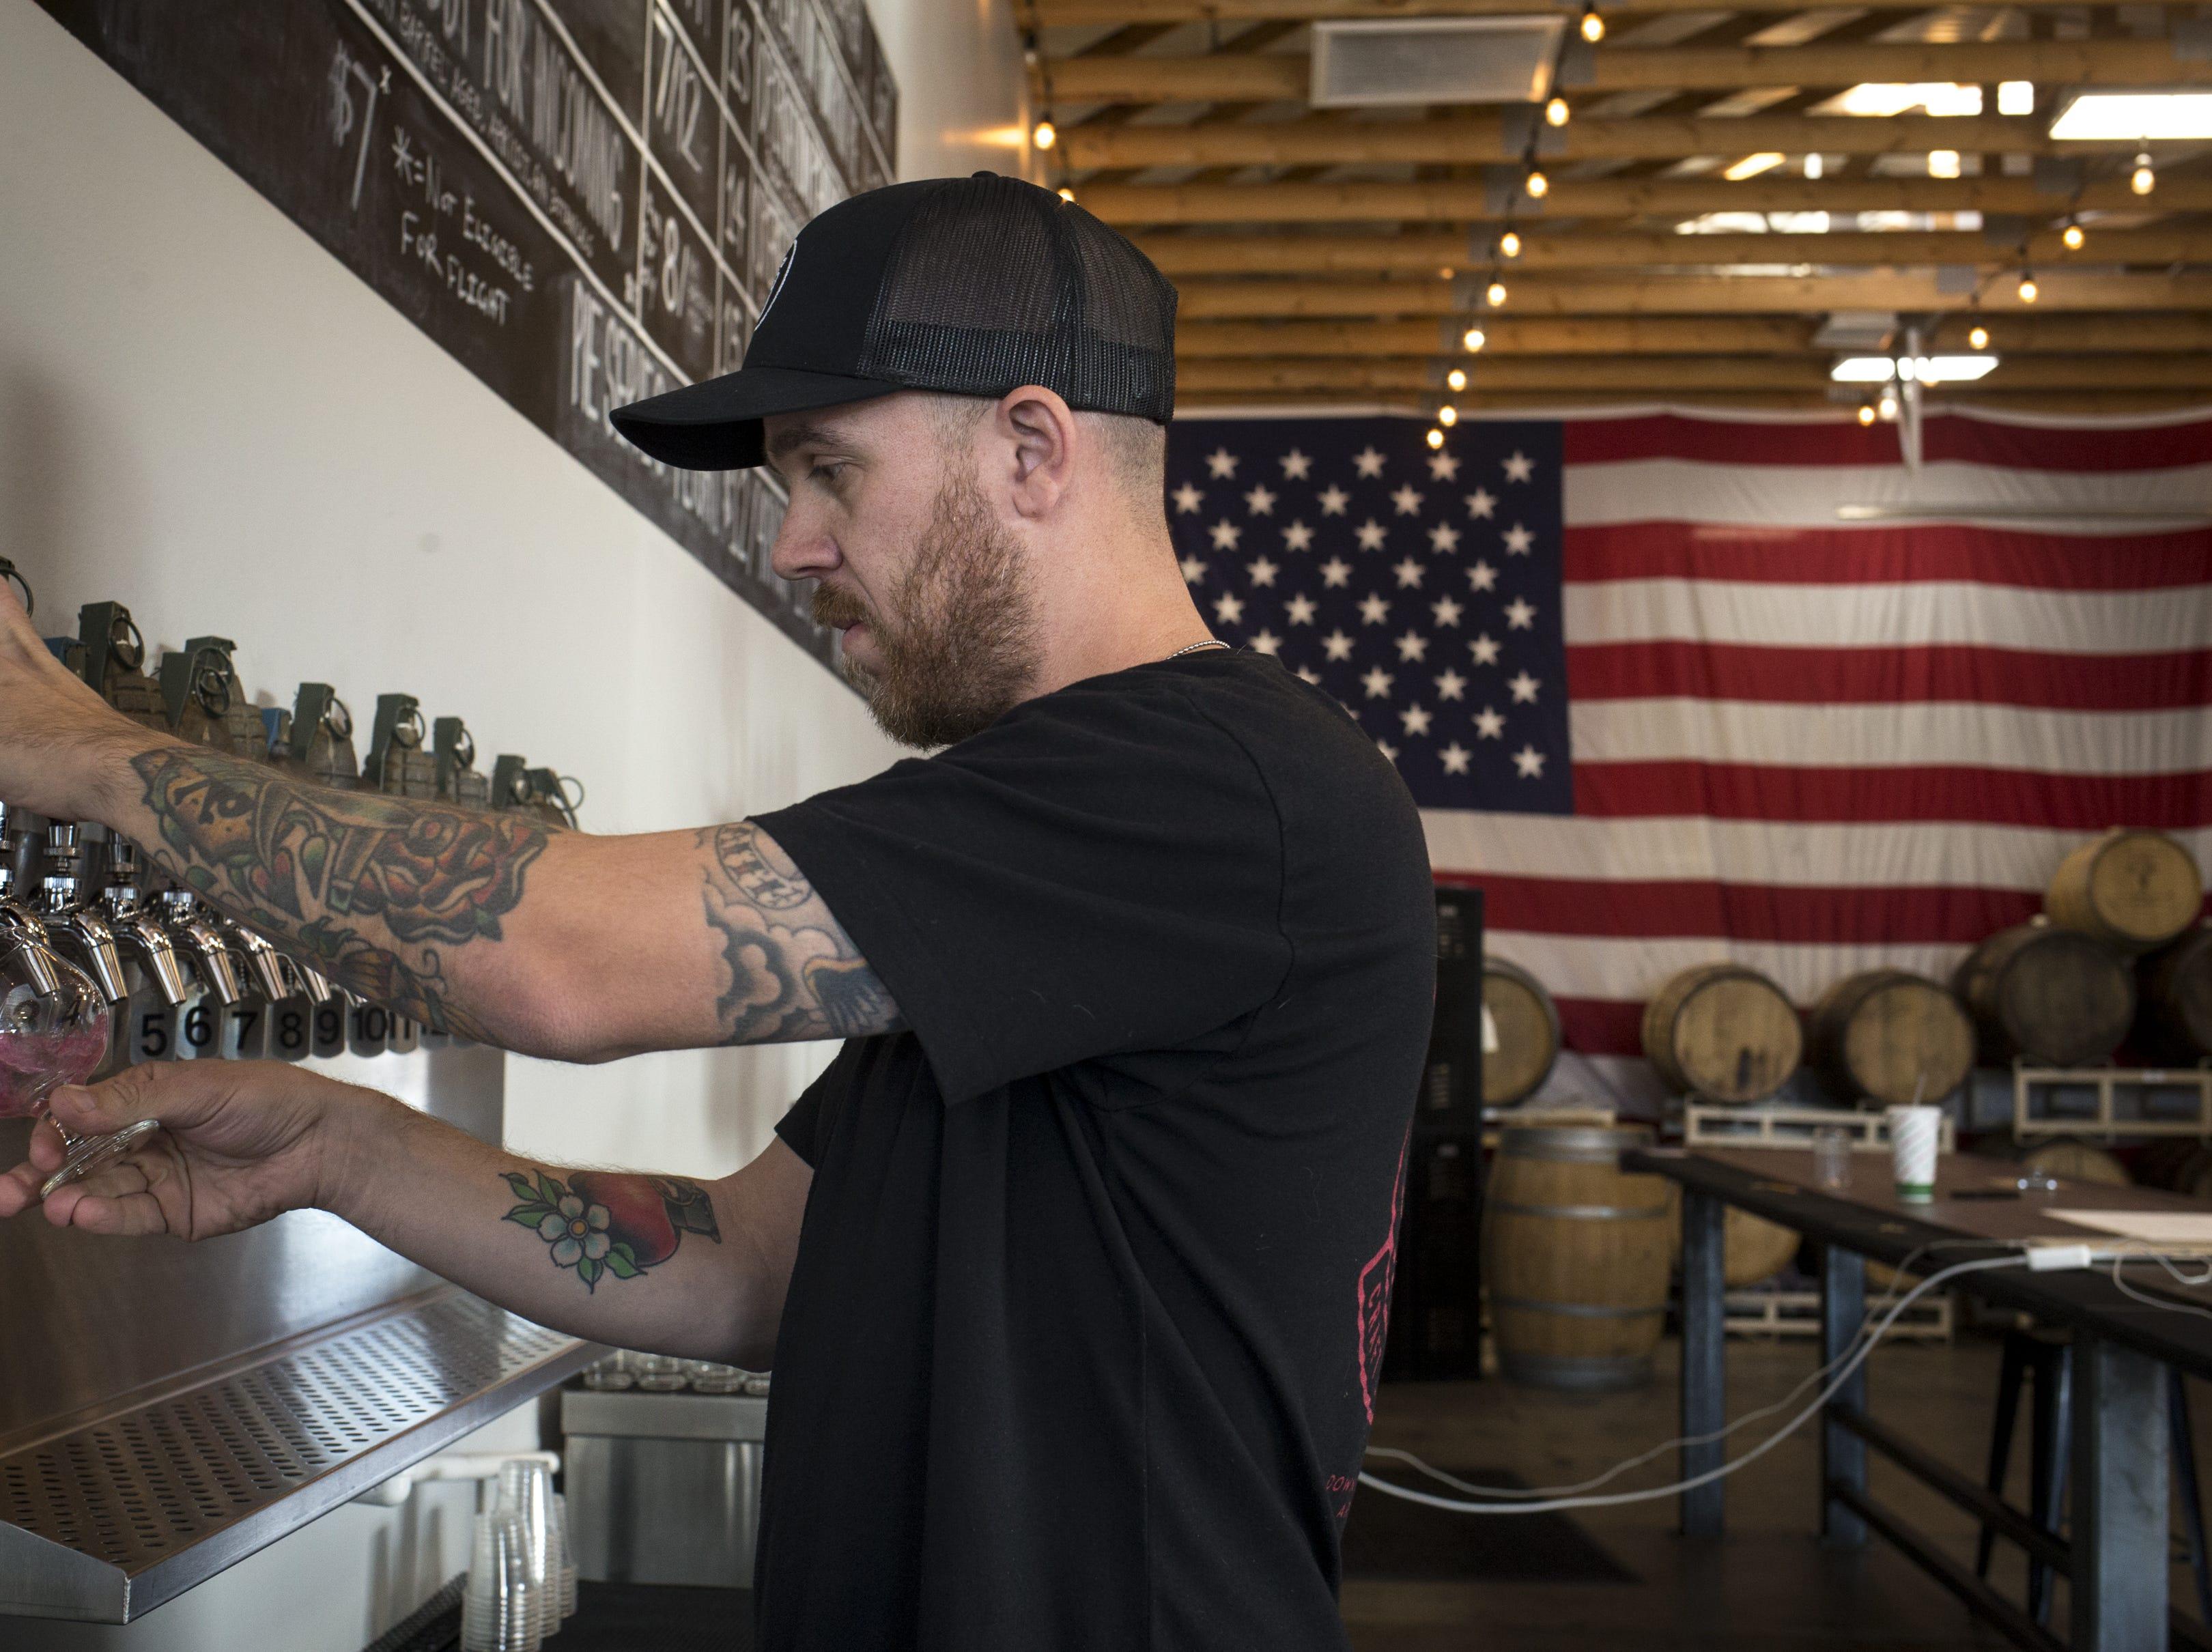 Josh Duren draws a cider, Dec. 5, 2018, at Cider Corps, 31 S. Robson, Mesa.